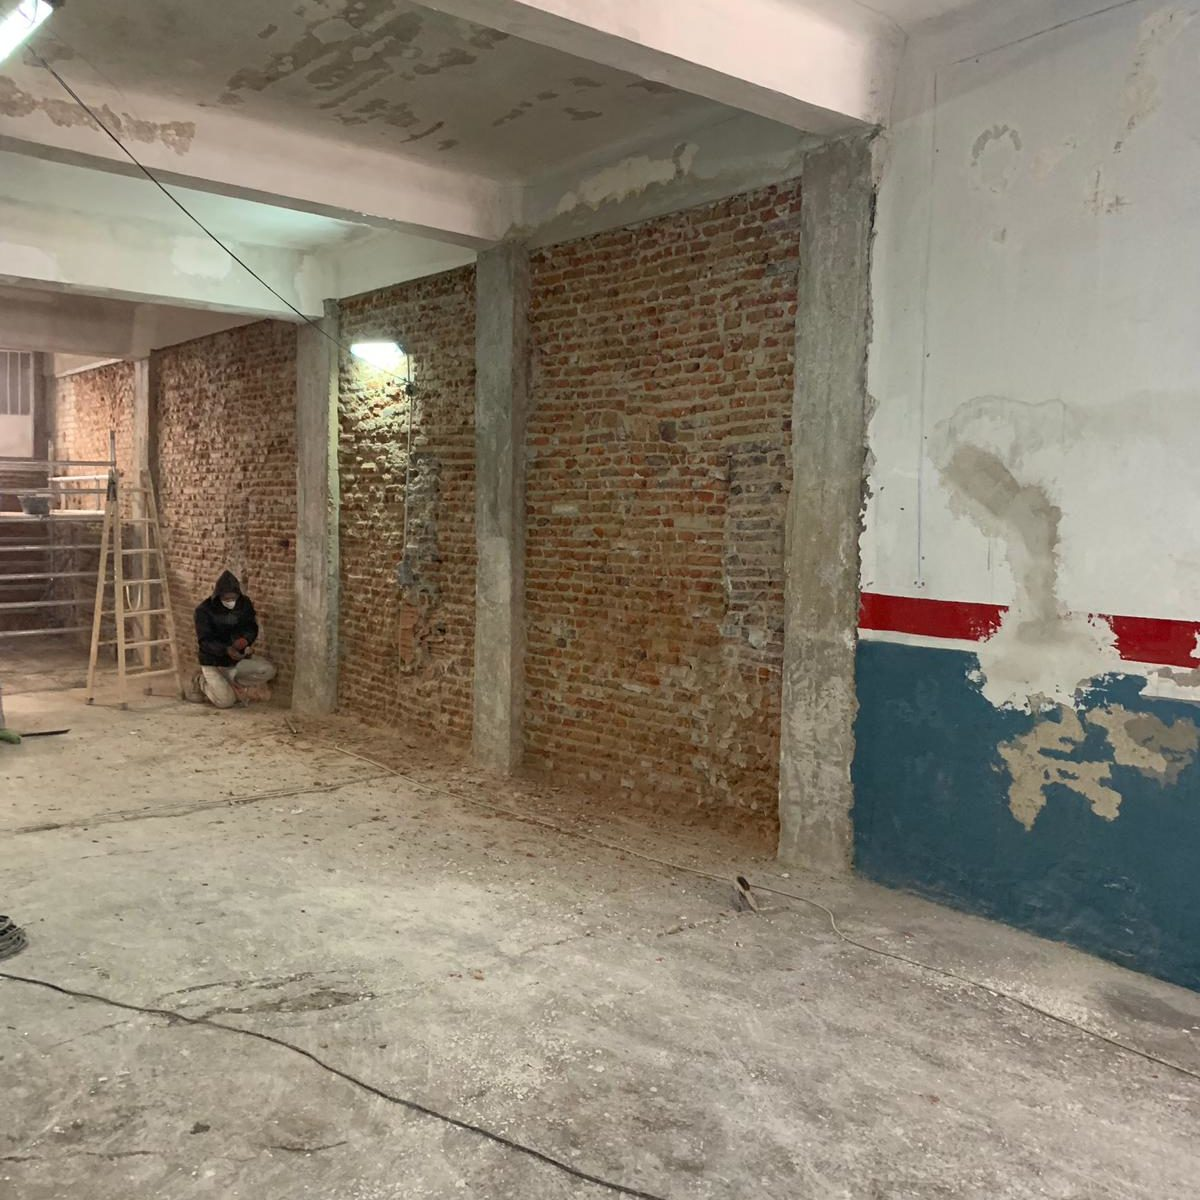 muros en ladrillo visto antes de la reforma integral